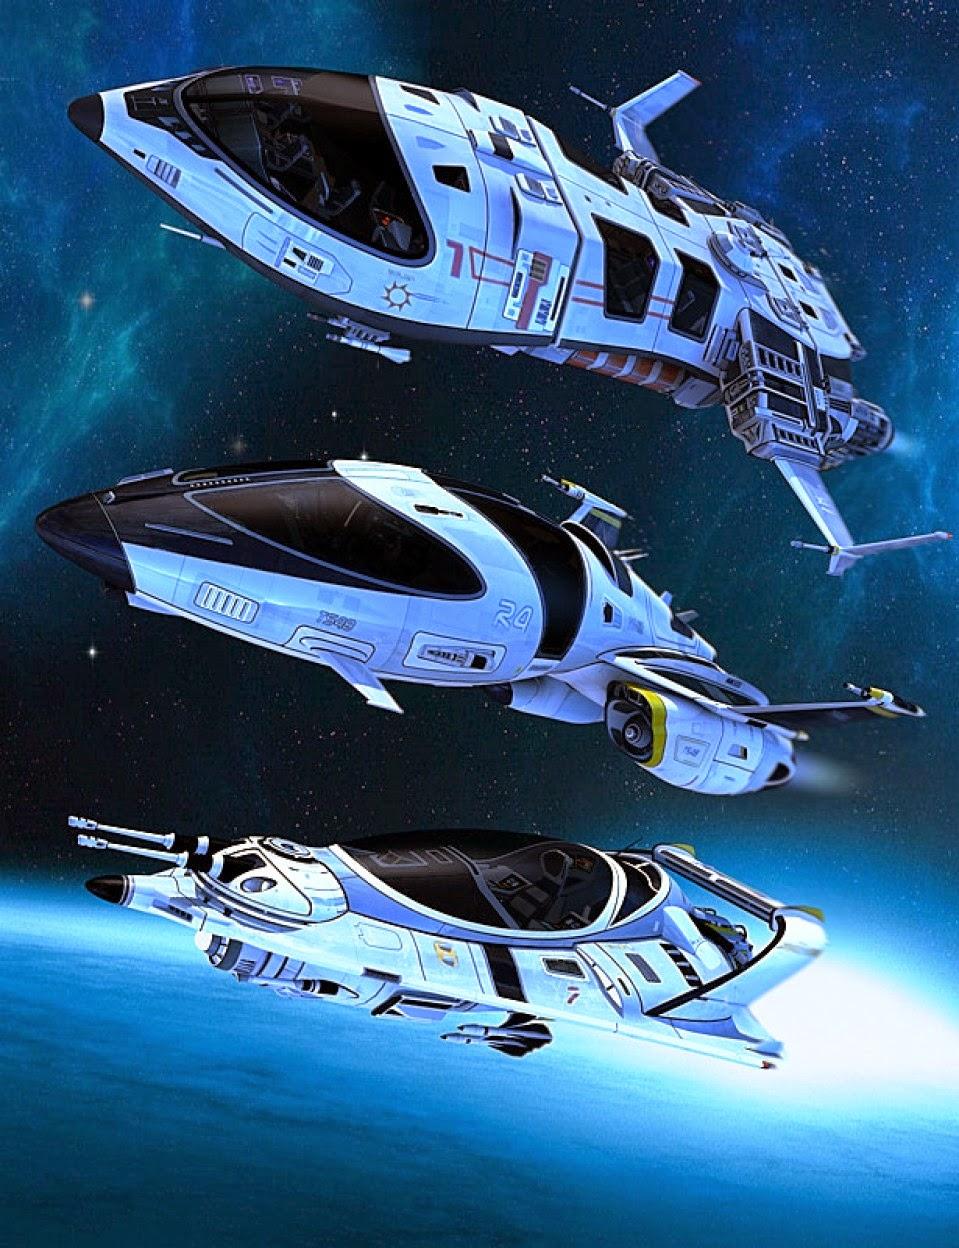 Poser and DAZ Studio 3D Models: Spaceship|DAZ Studio and Poser Content